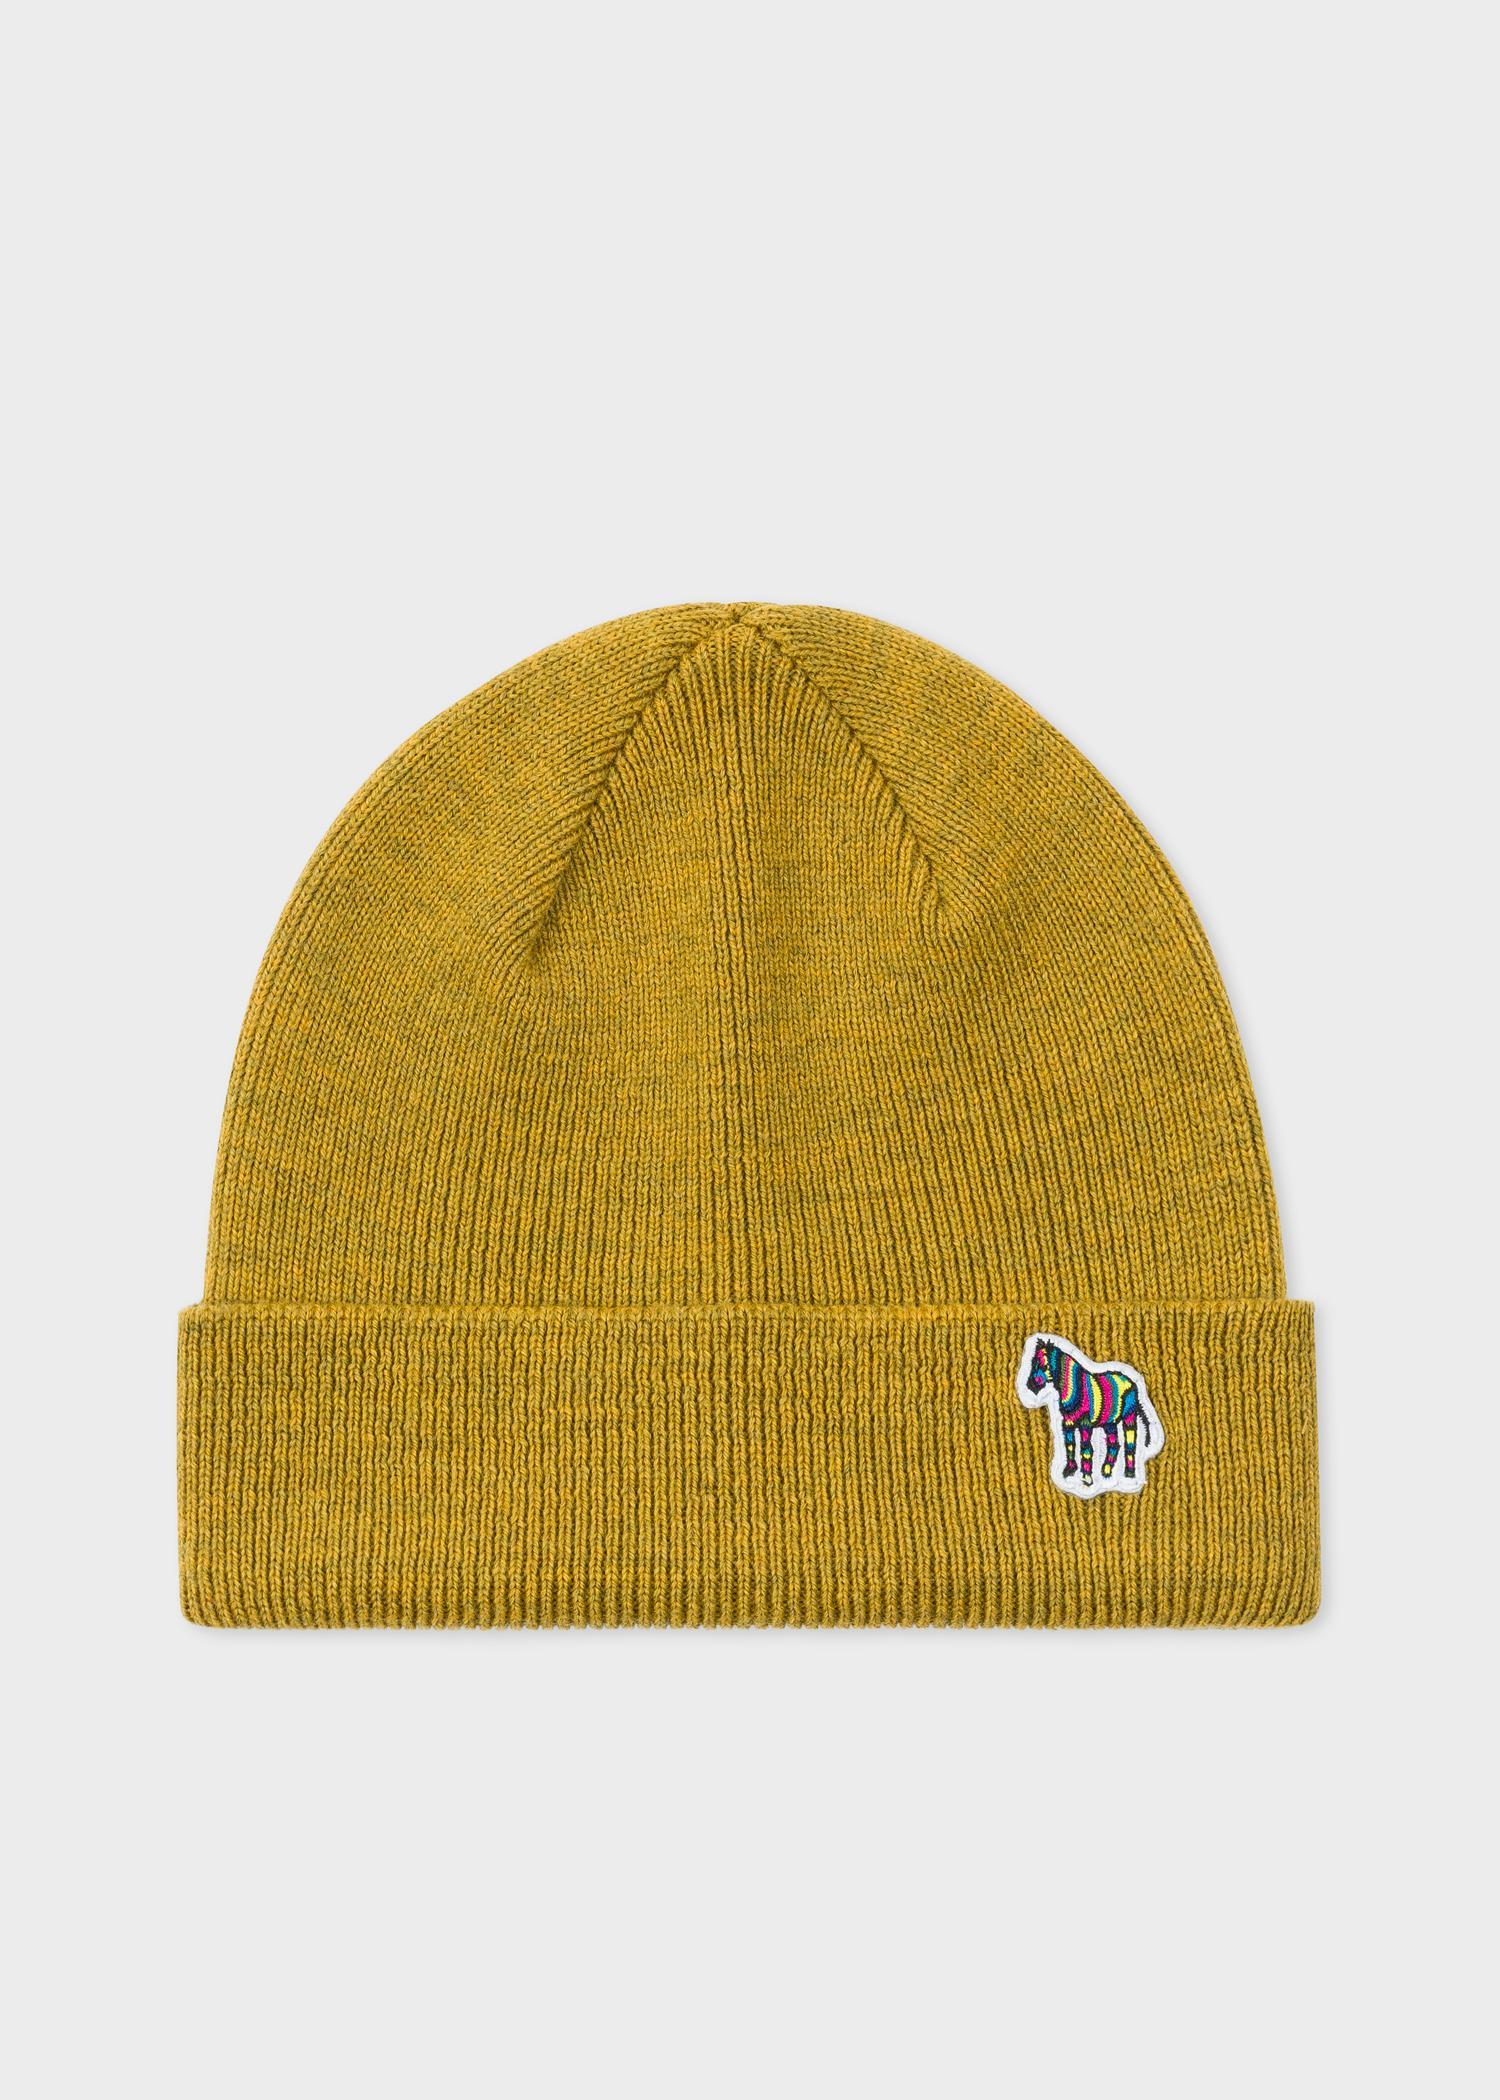 6e5fdfde8 Paul Smith Mustard 'zebra' Logo Ribbed Lambswool Beanie Hat in ...